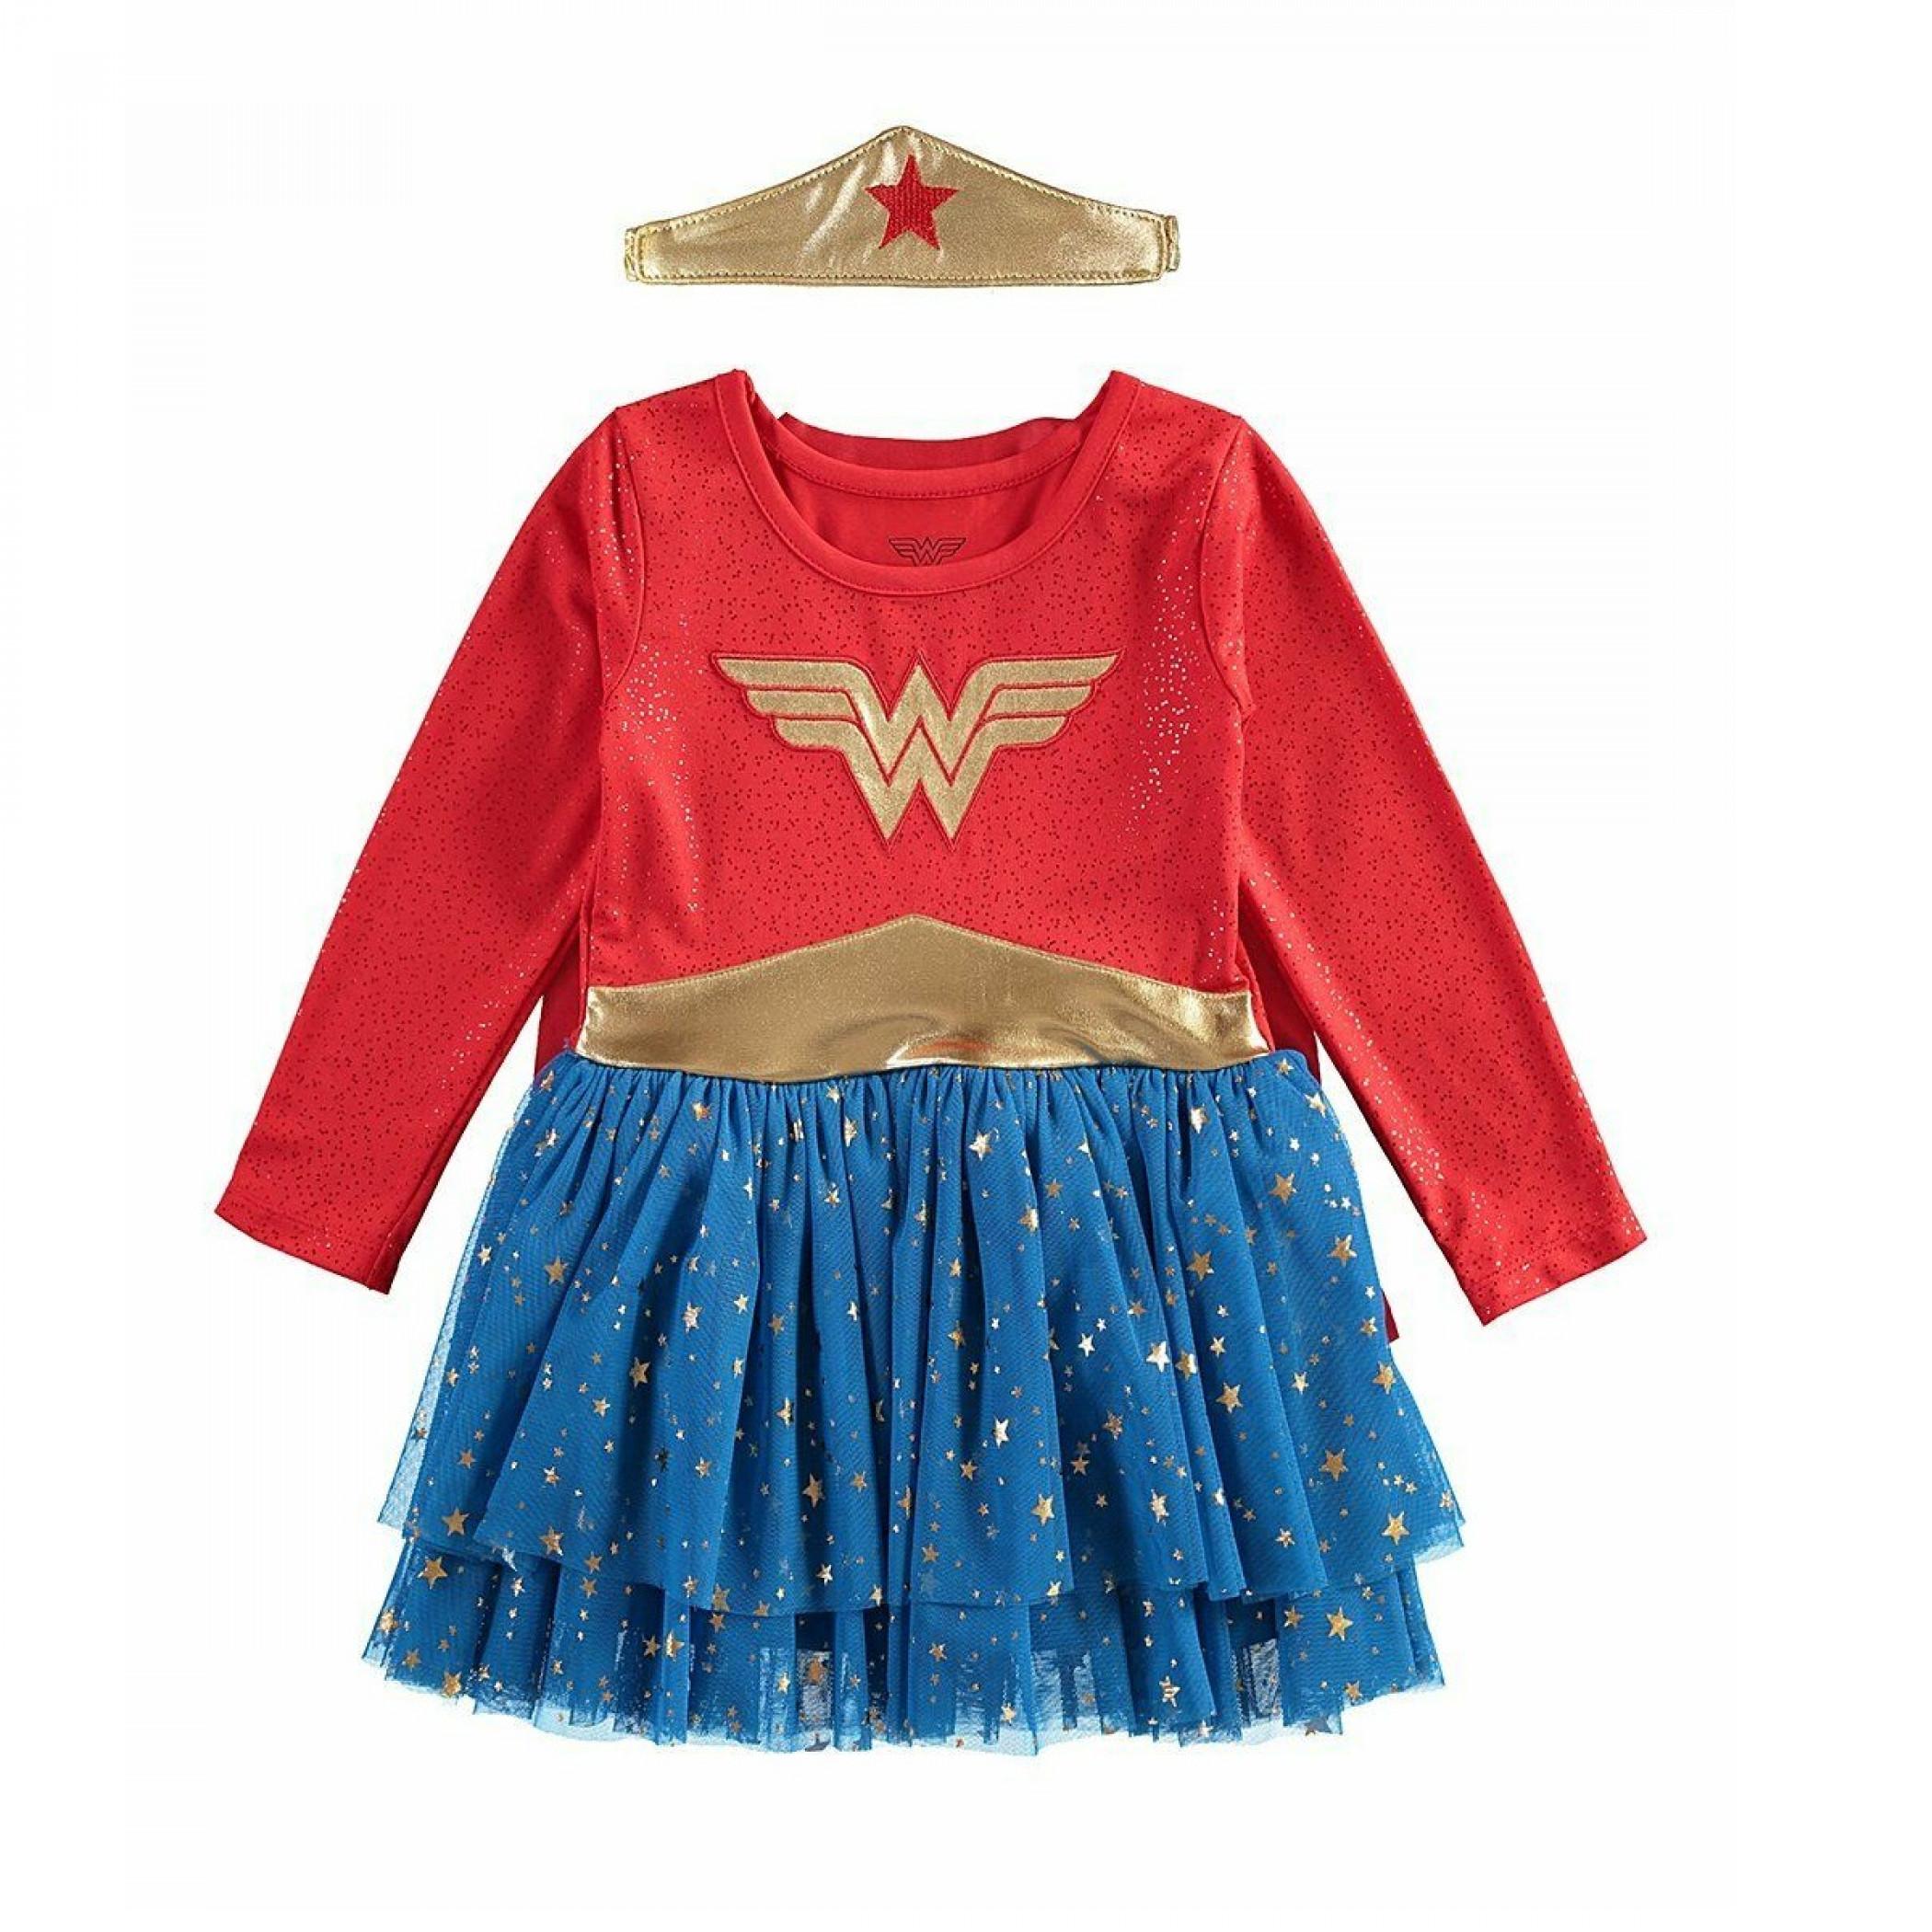 Wonder Woman Dress Up Dress with Cape and Tiara Headband